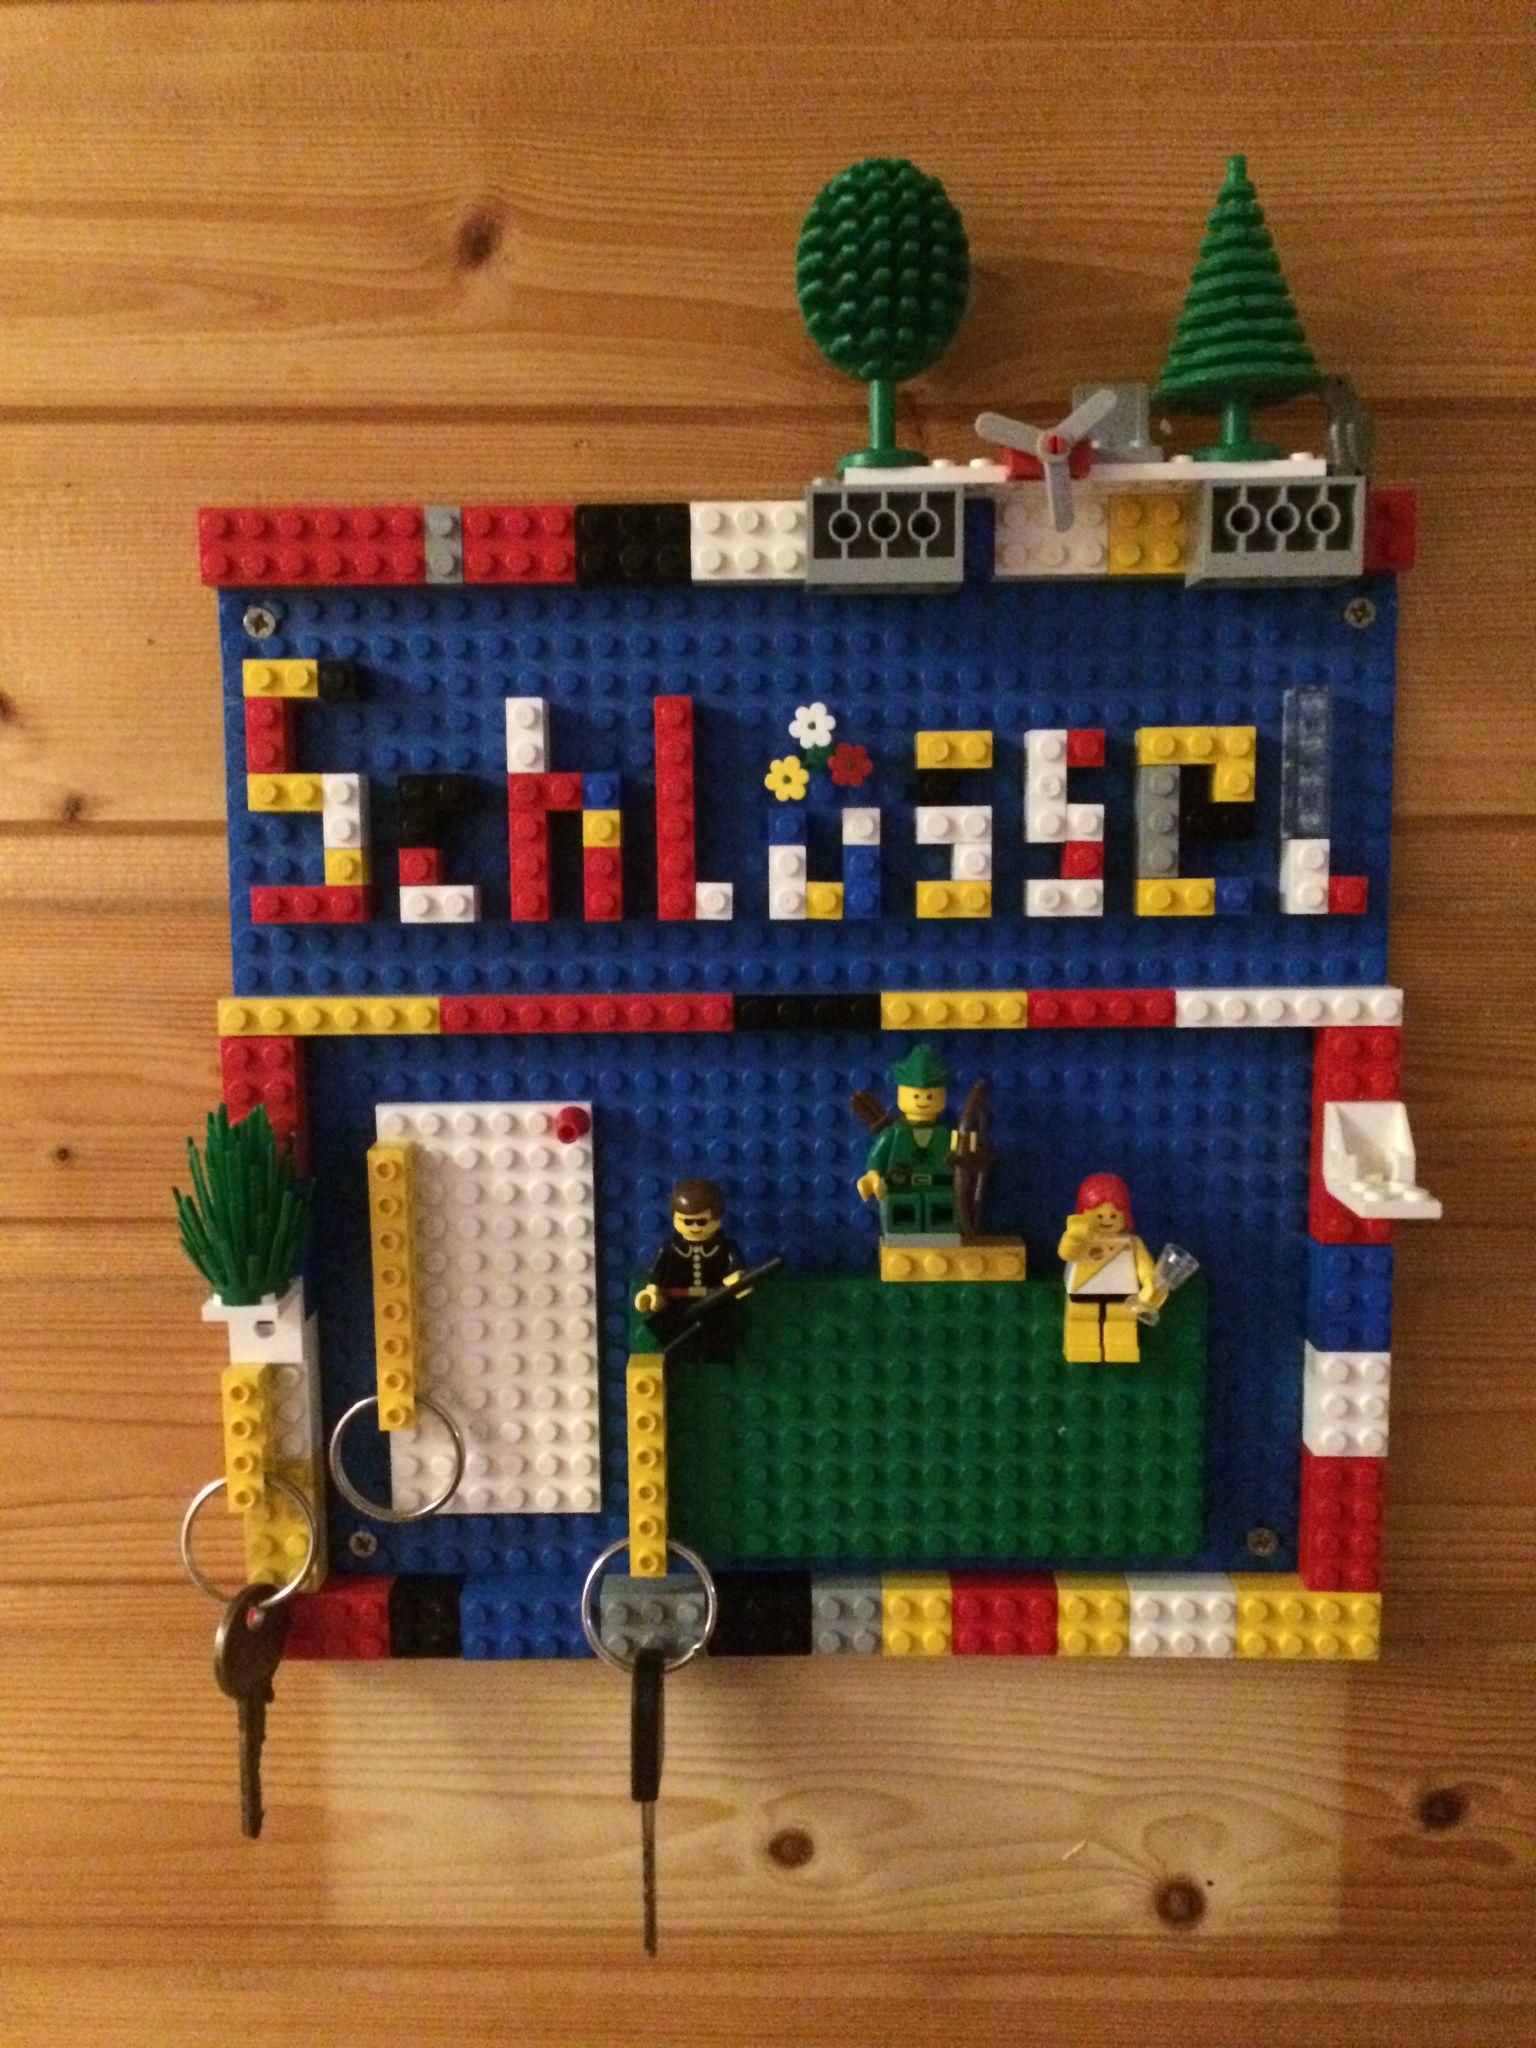 schlüsselbrett aus lego | creative | pinterest | creative